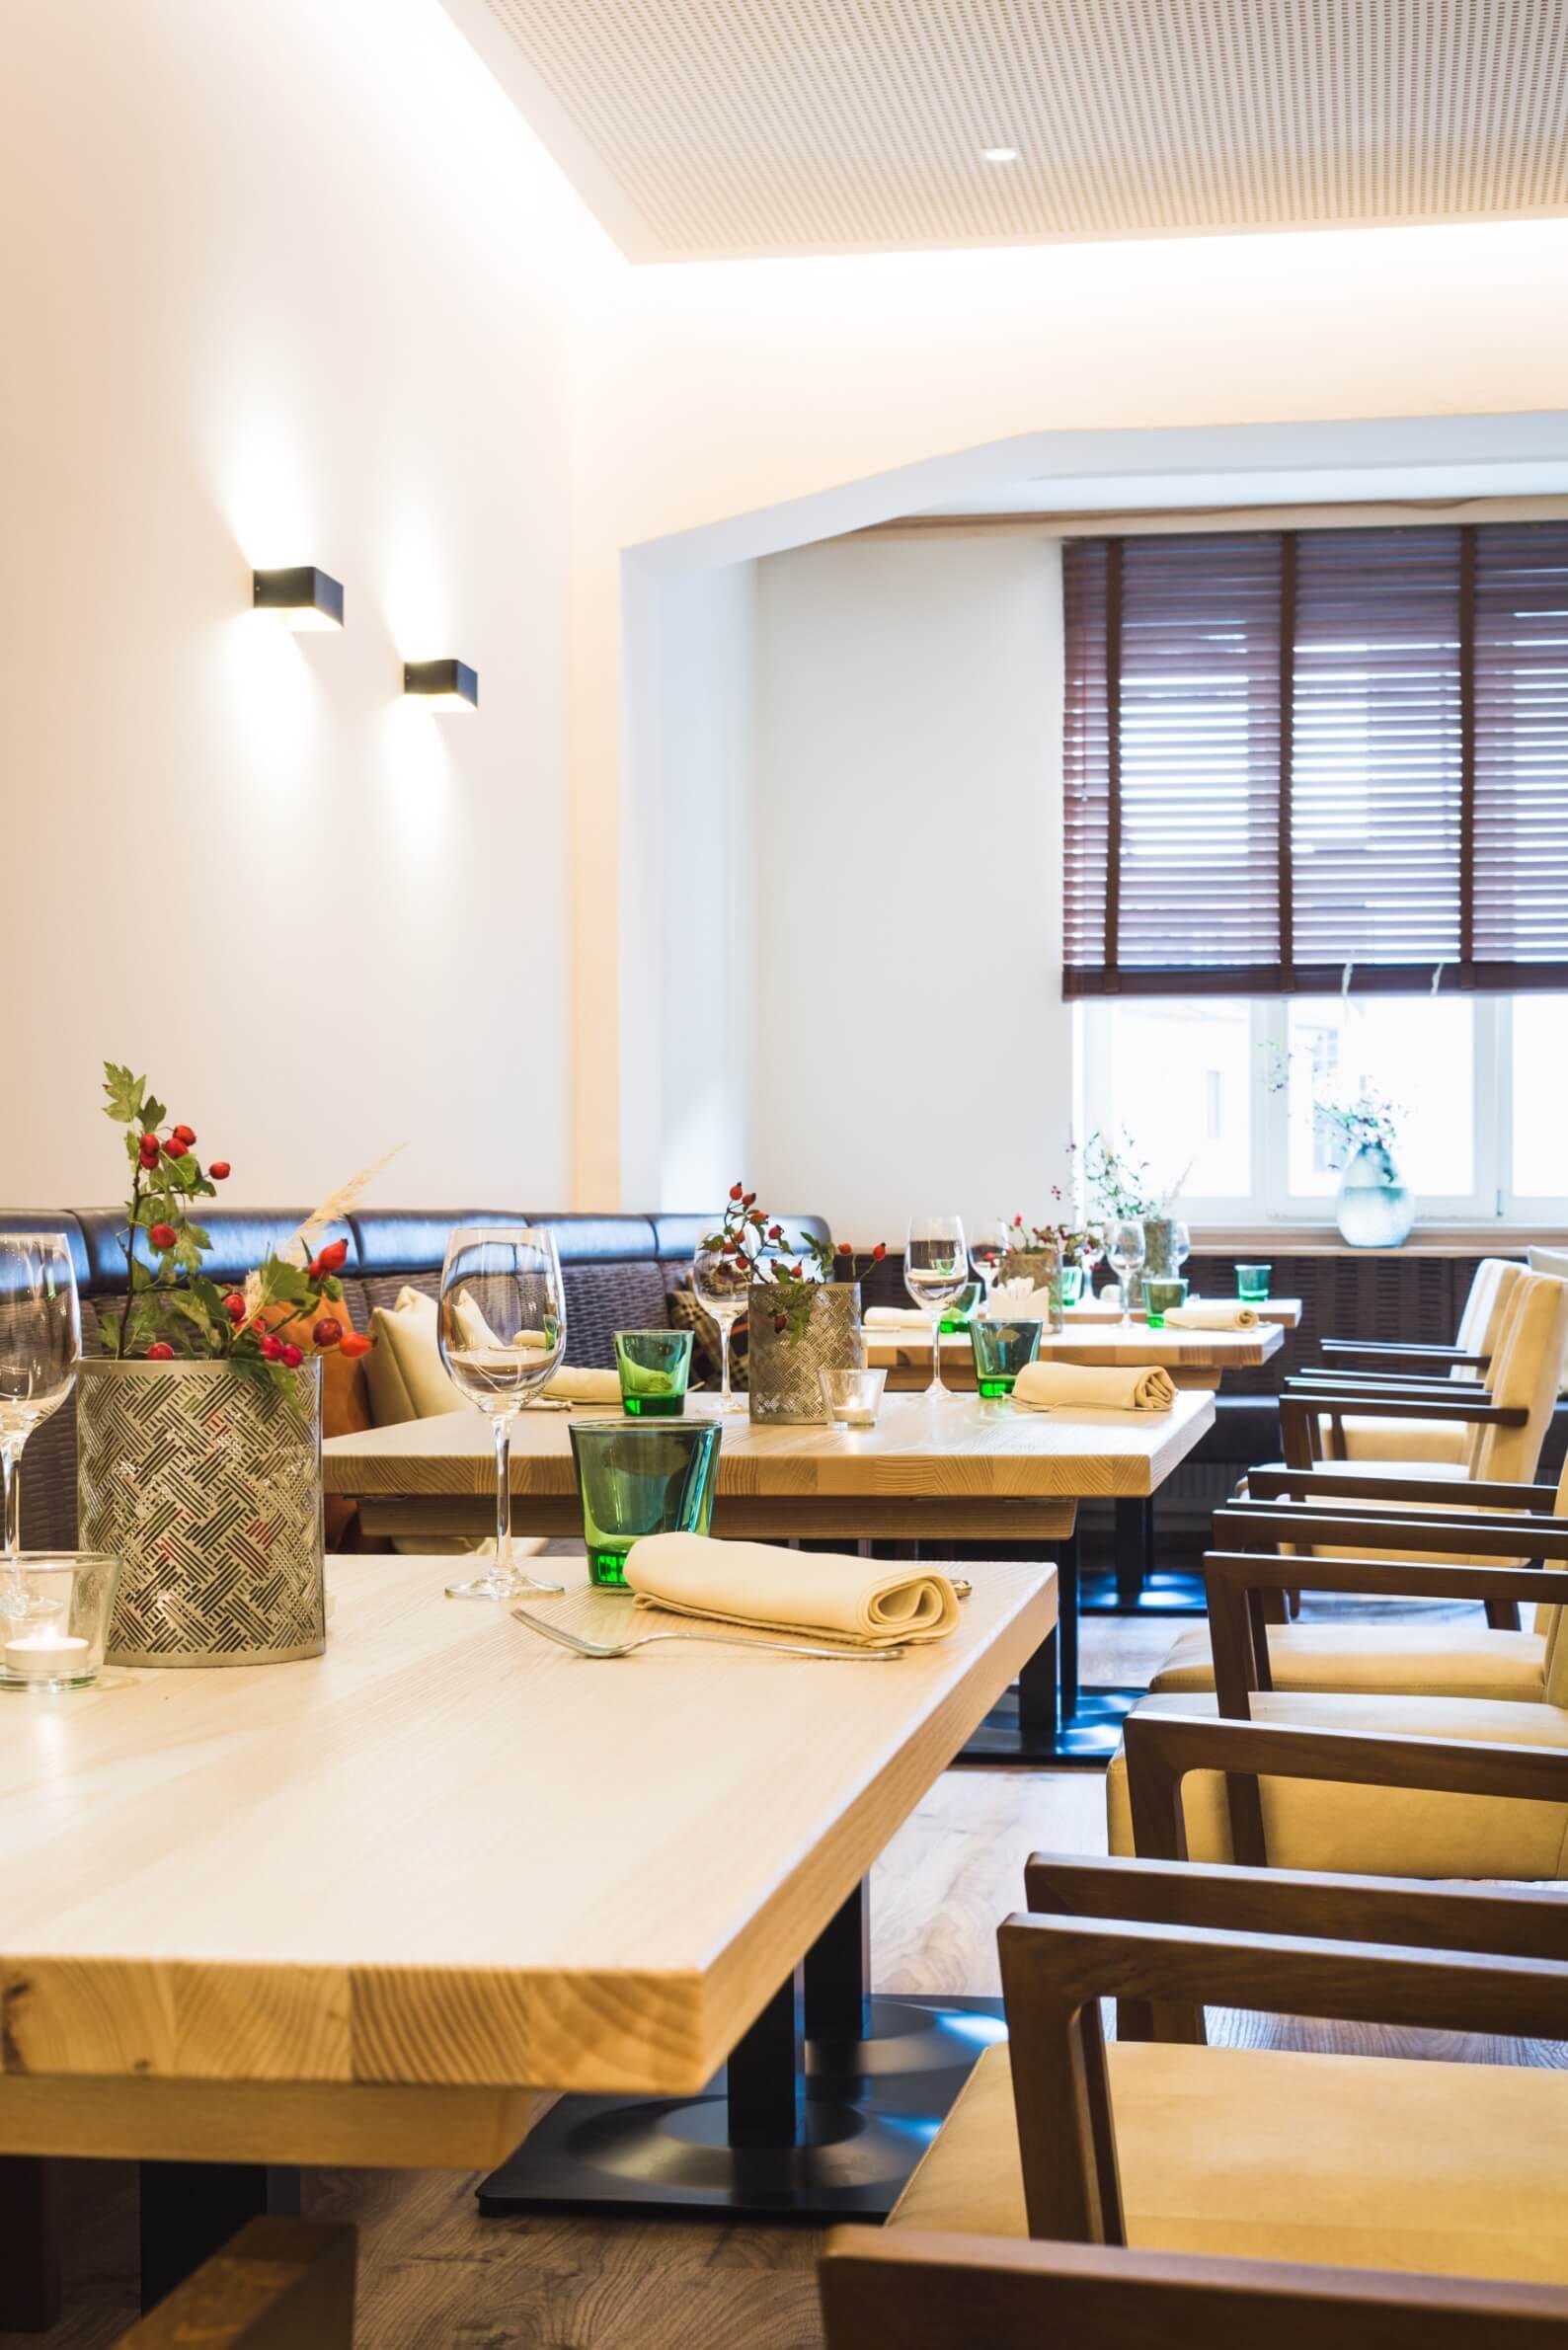 CP_Gasthaus-Klinglhuber-Krems_03@2x